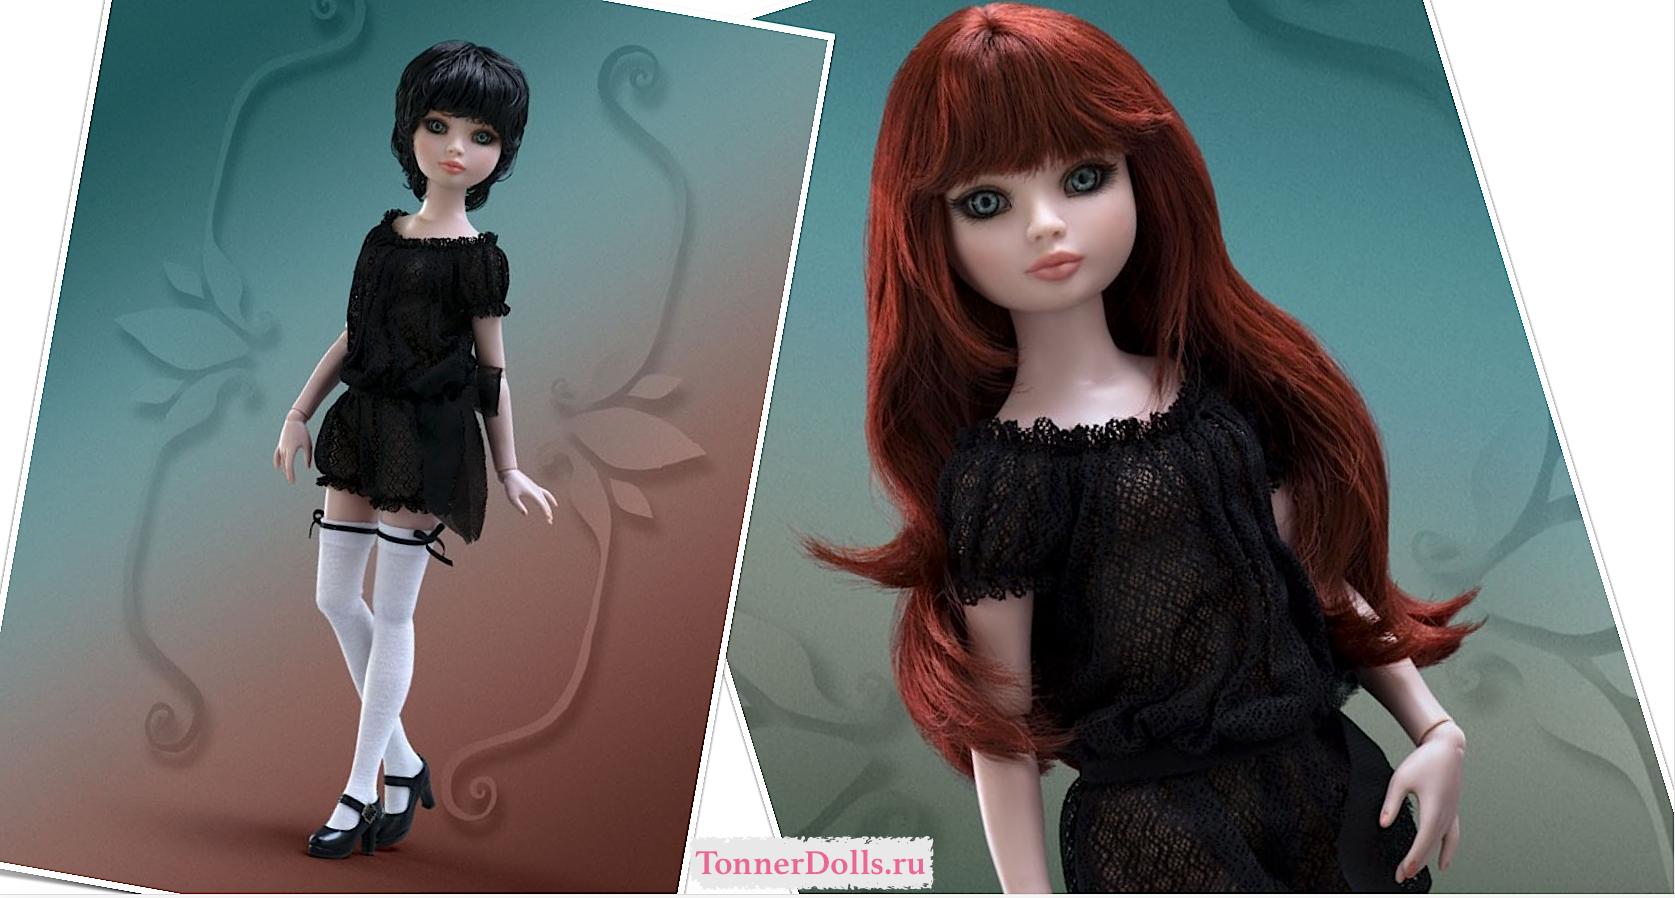 Под заказ Кукла 2 парика Ellowyne Feeling Drained Wigged Basic / Элловайн Опустошенная